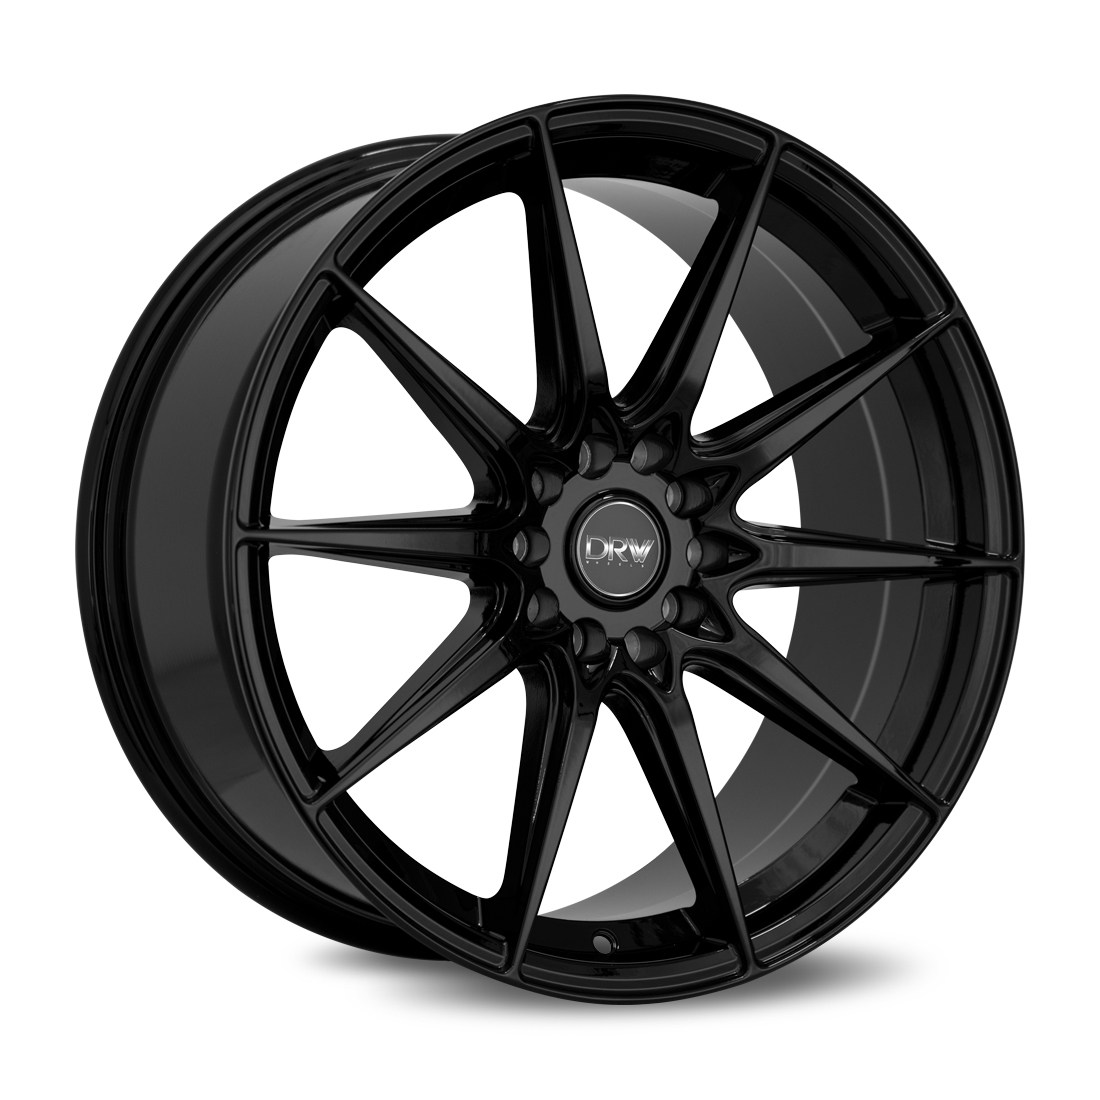 Diablo Racing Wheels DRW D19 - Gloss Black Rim